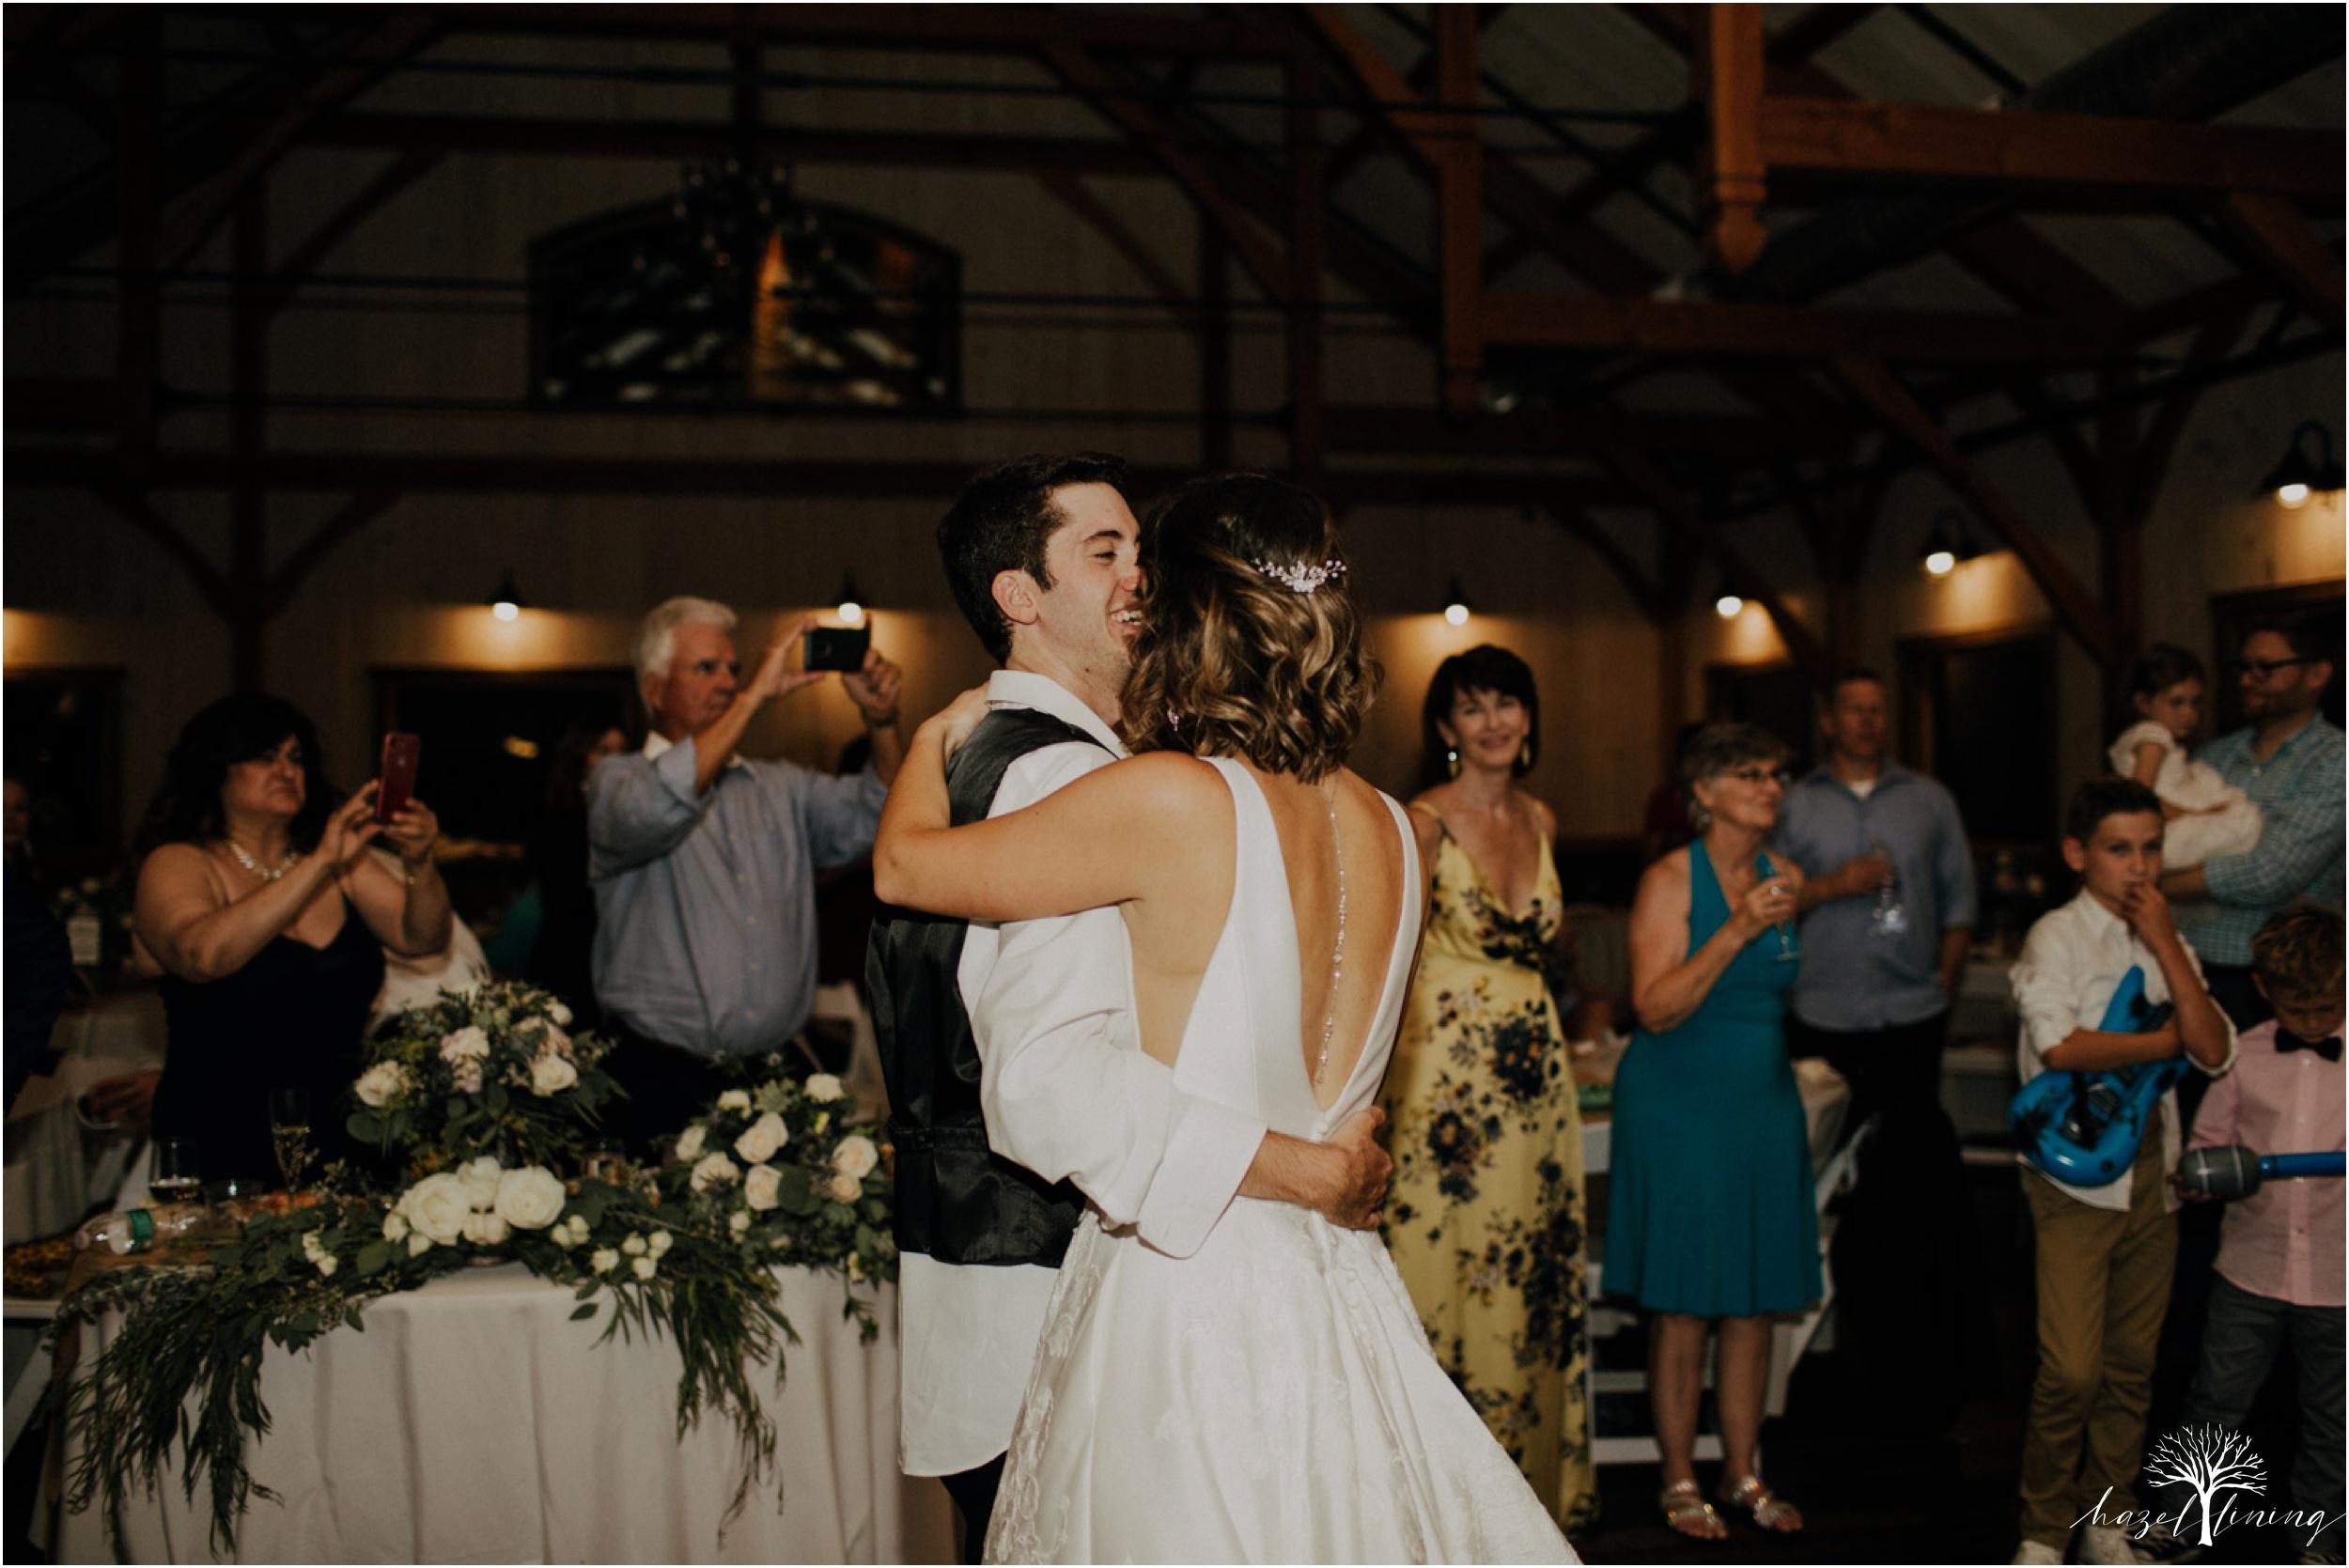 maureen-hepner-anthony-giordano-rose-bank-winery-newtow-pennsylvania-luxury-summer-wedding-hazel-lining-photography-destination-elopement-wedding-engagement-photography_0160.jpg